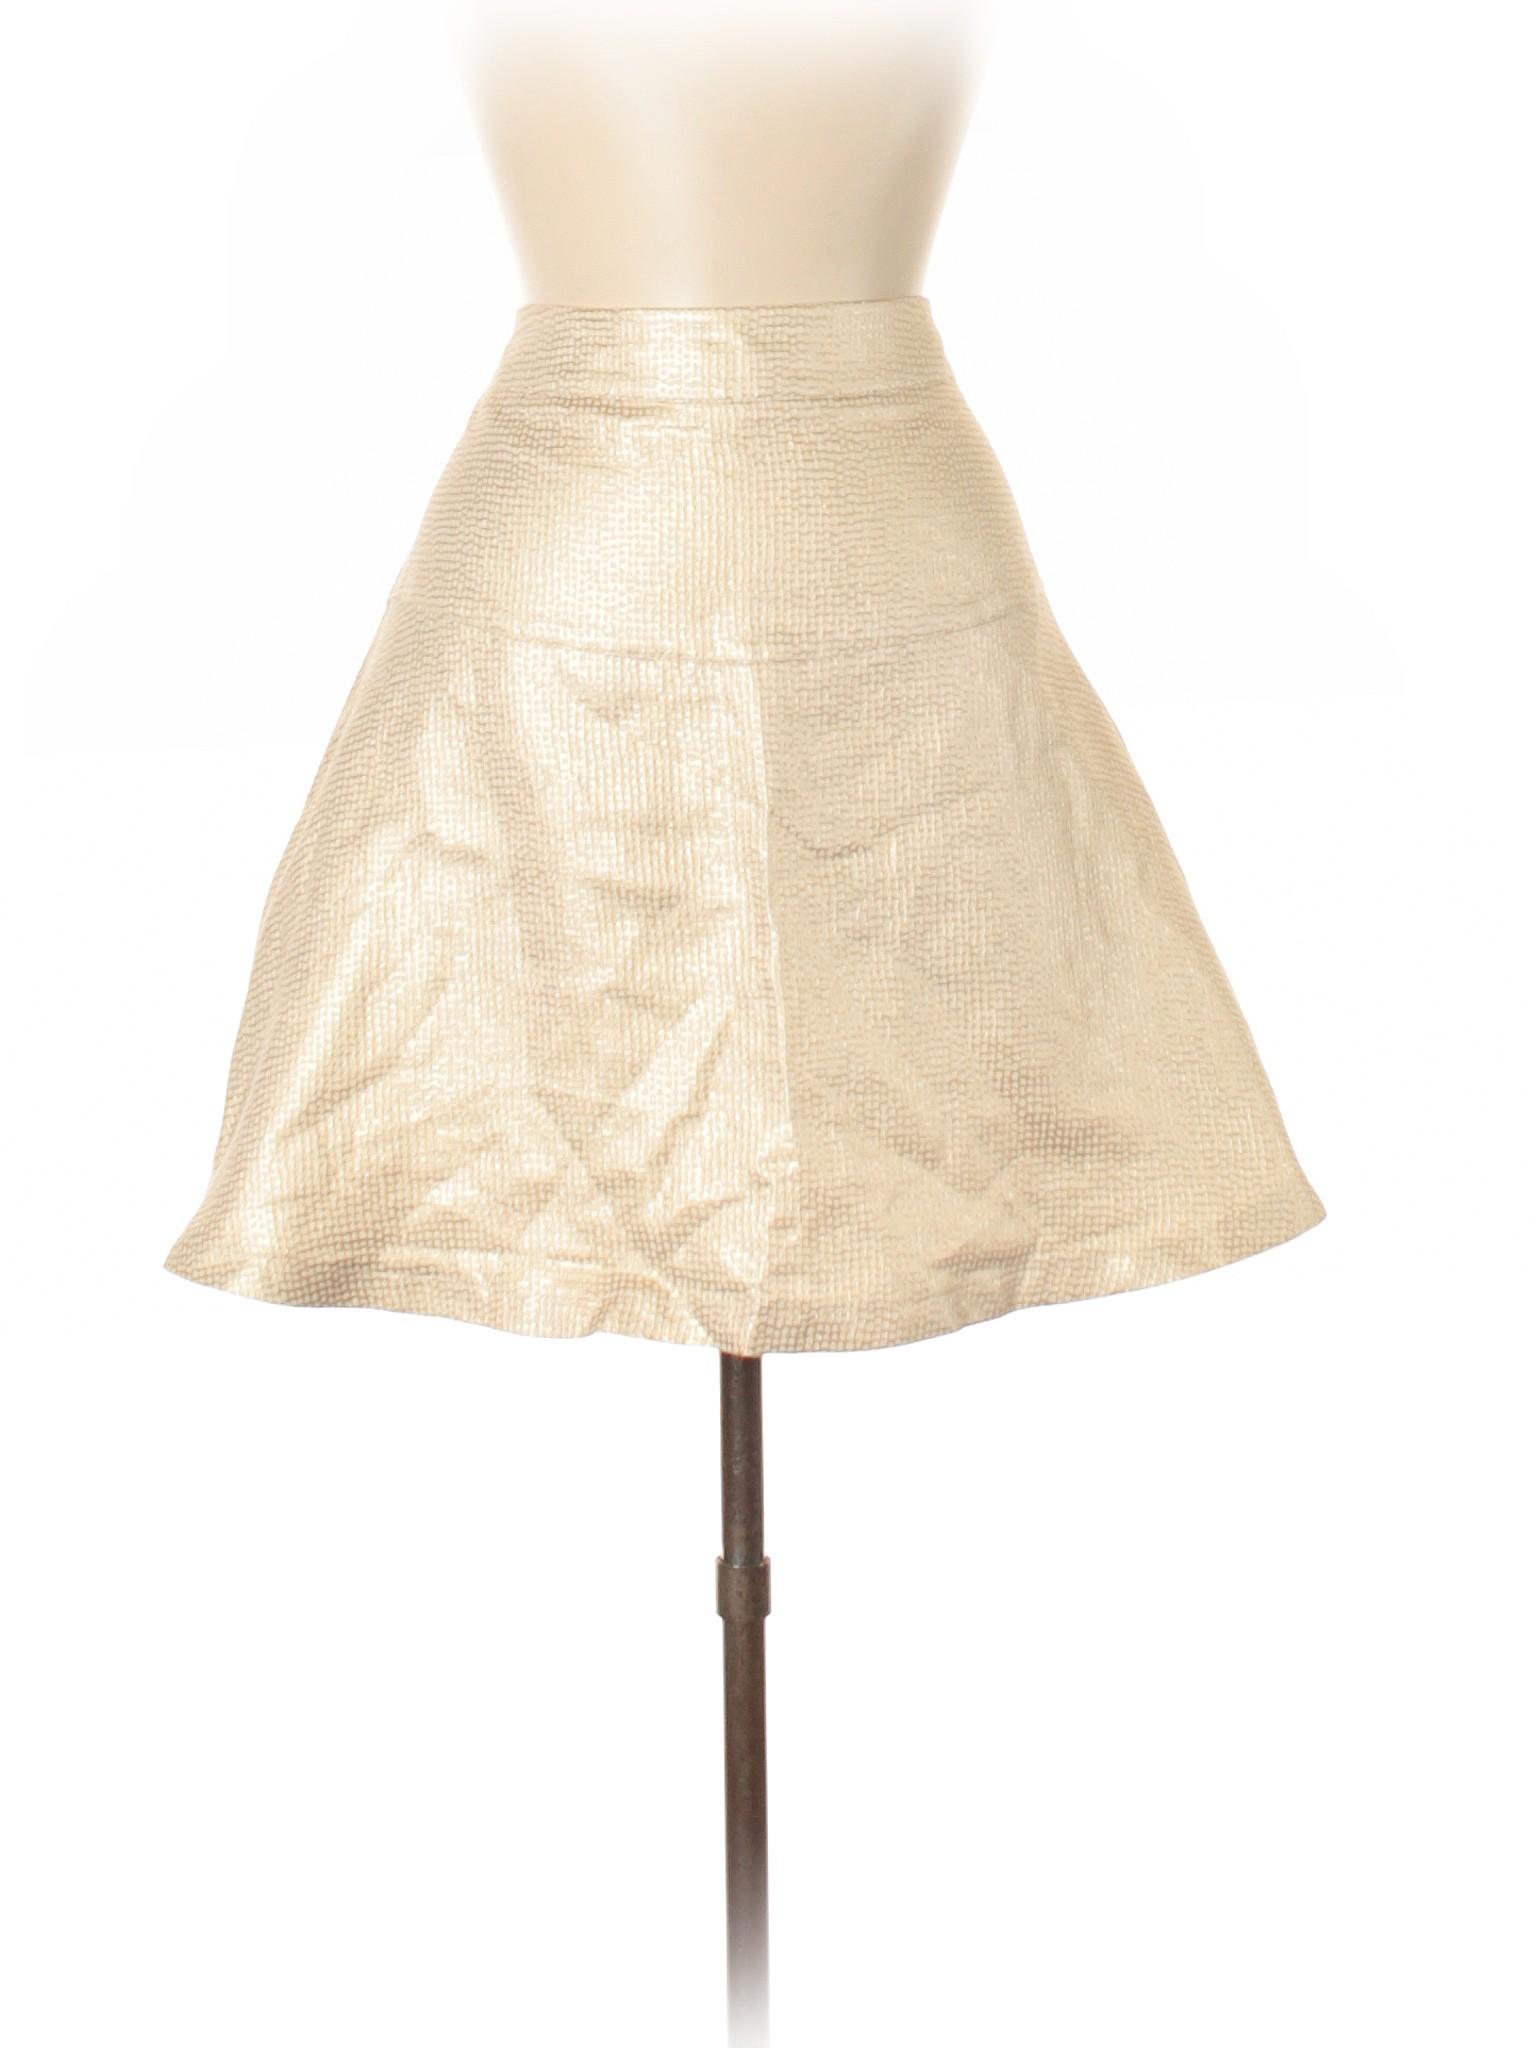 Boutique Formal Skirt Formal Boutique Skirt Boutique Formal Skirt 8pw68d